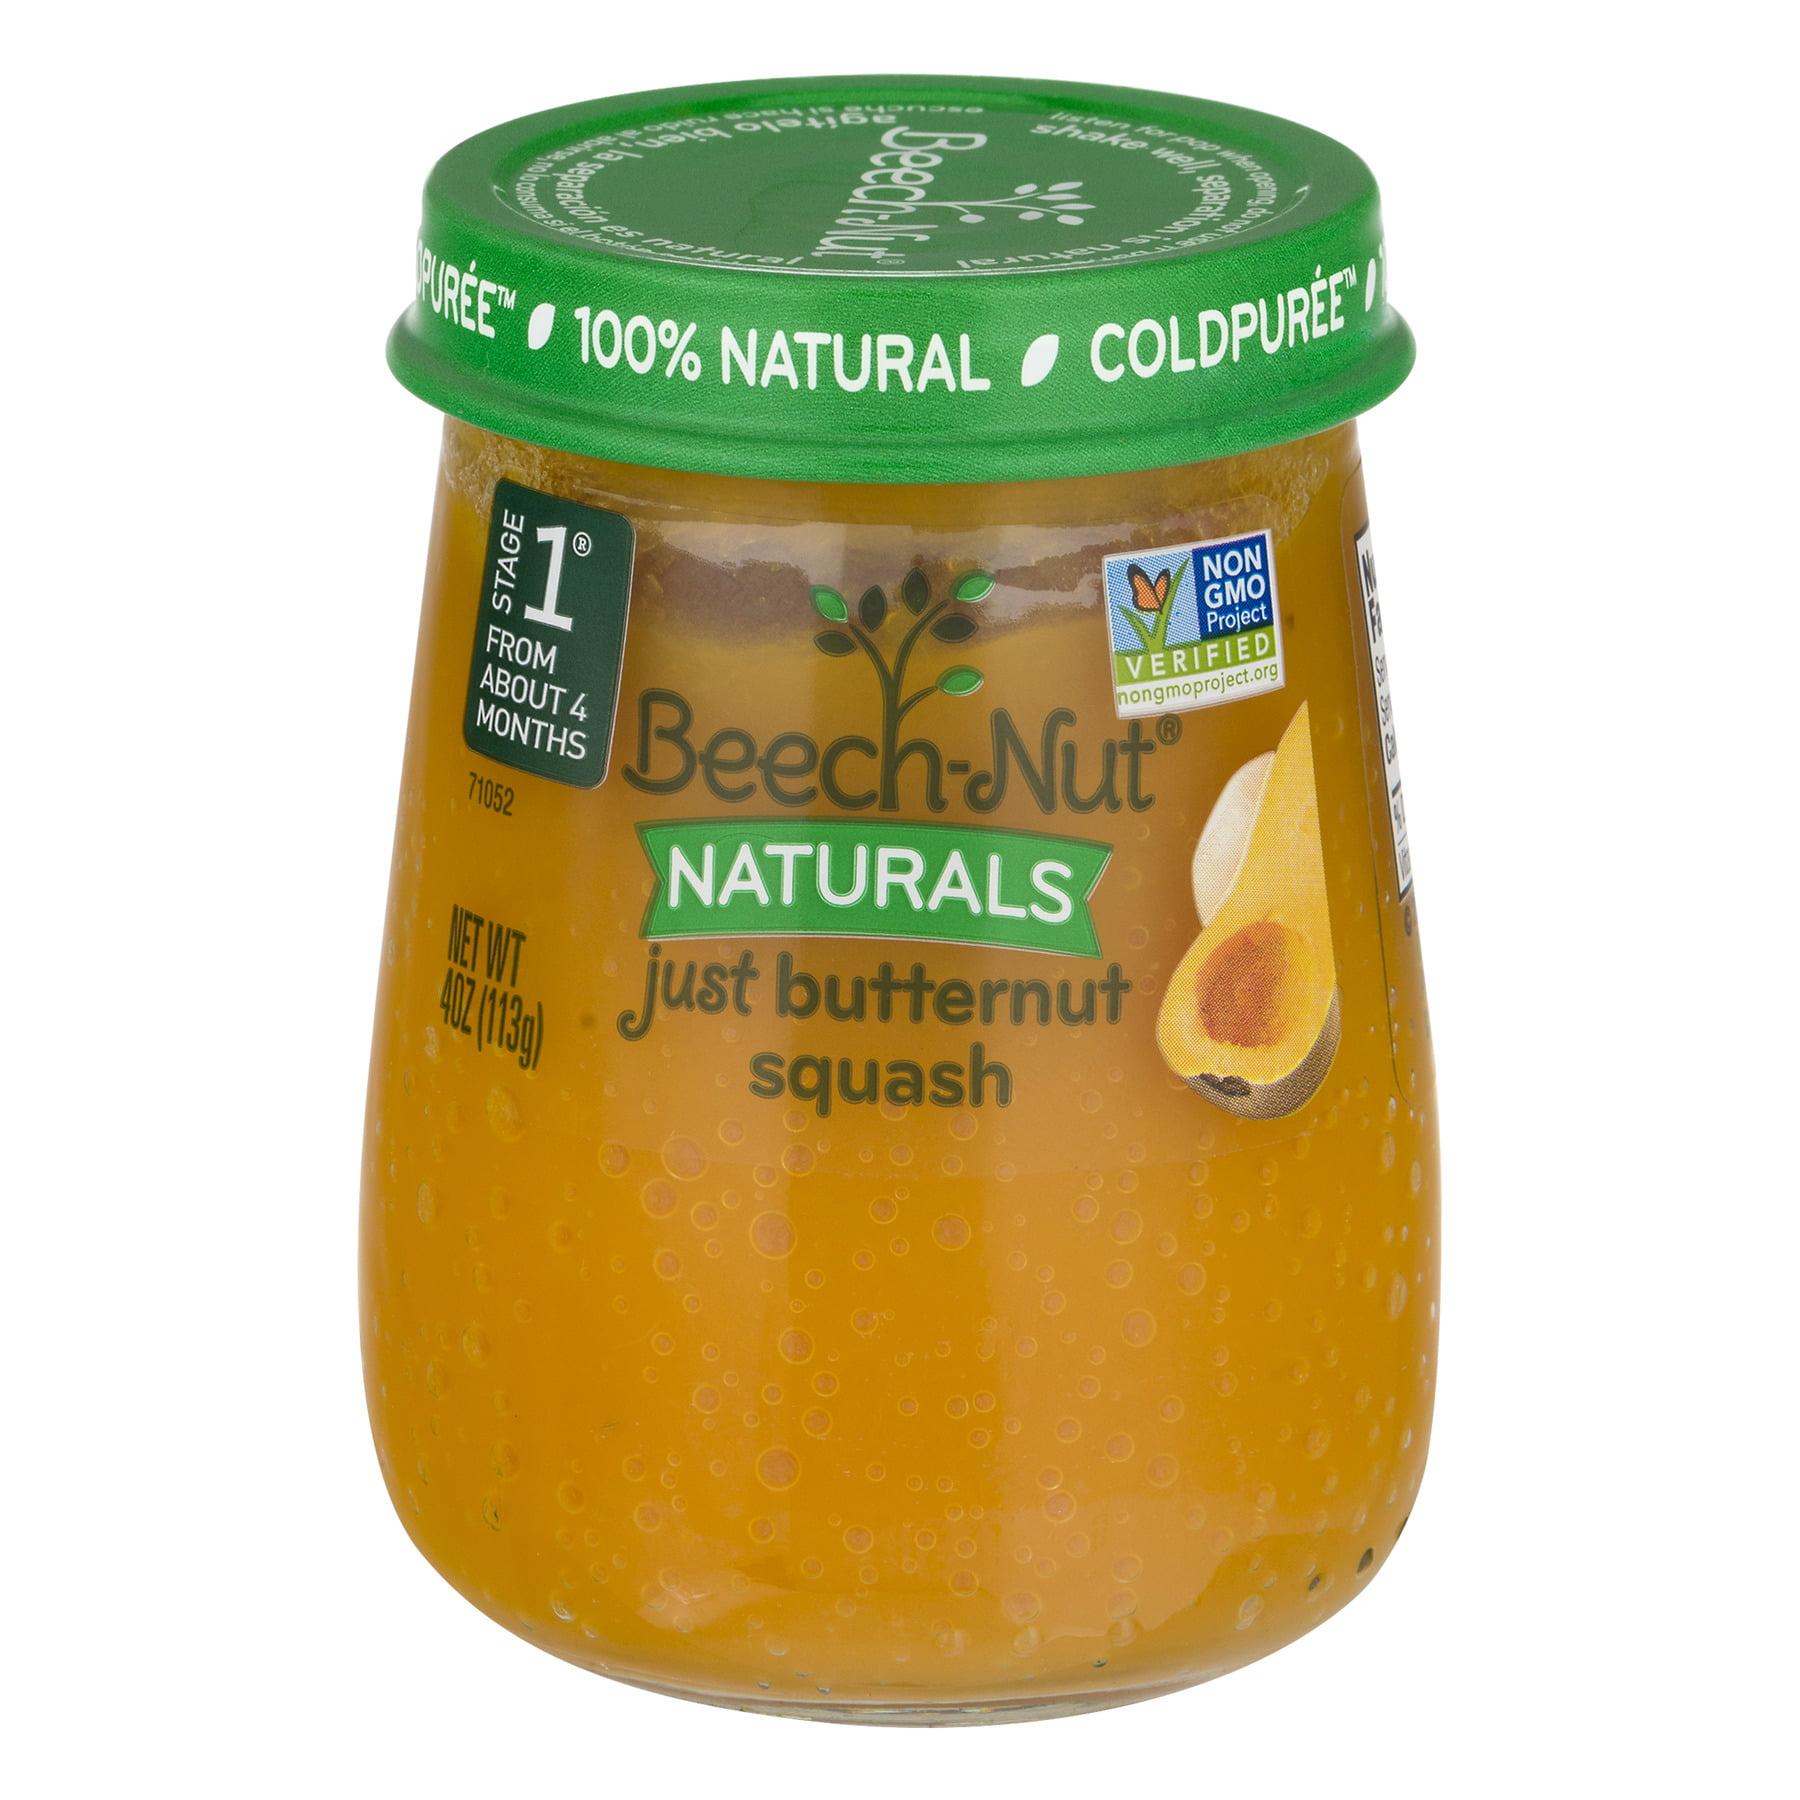 Beech-Nut Naturals Stage 1 Just Butternut Squash, 4.0 OZ